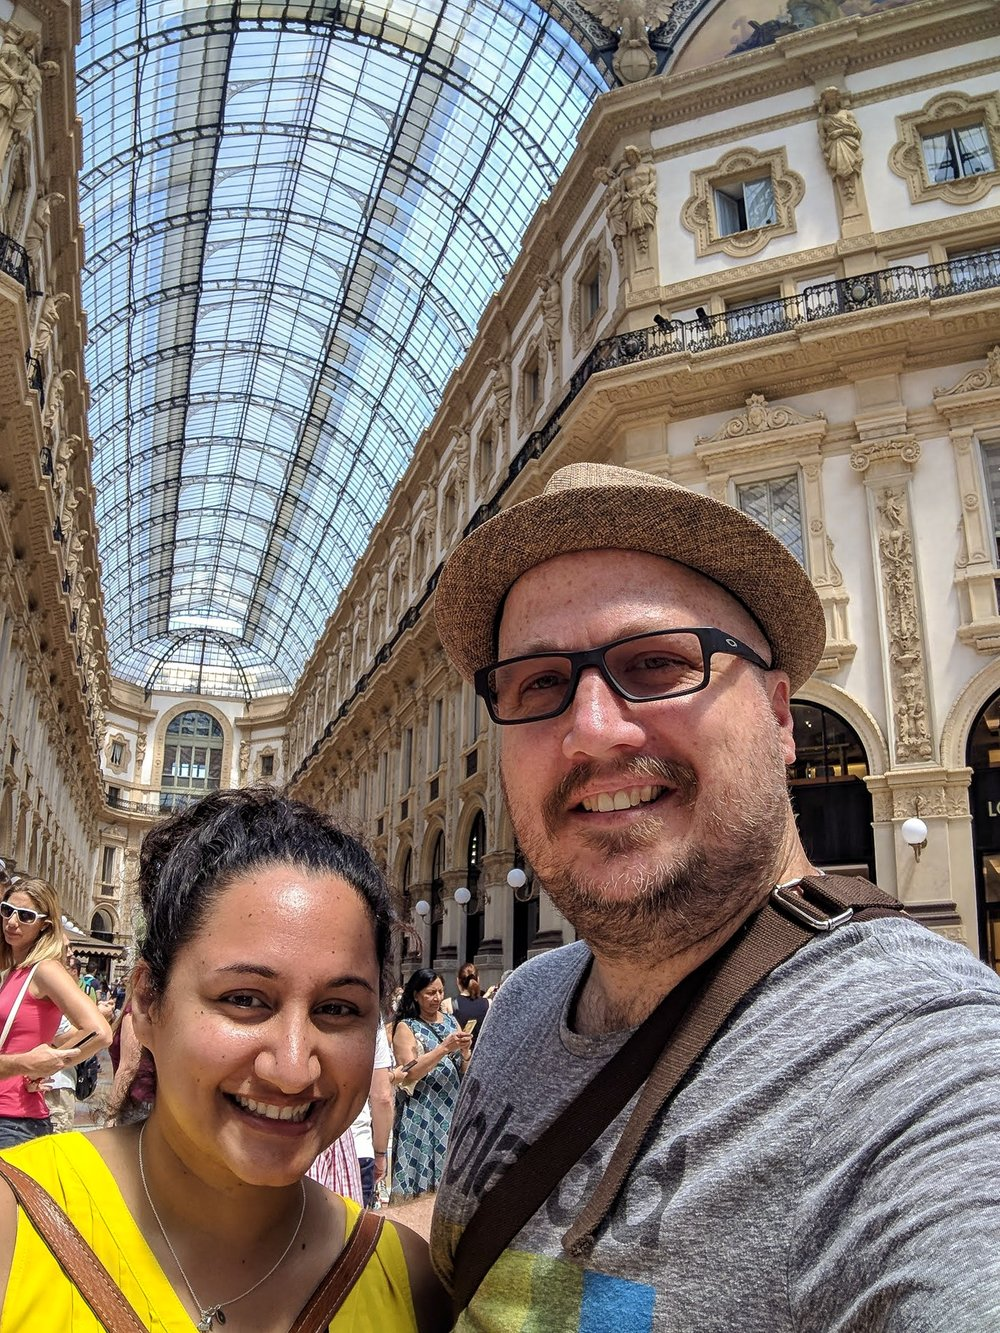 Mingling in Milan at the Galleria Vittorio Emanuele II